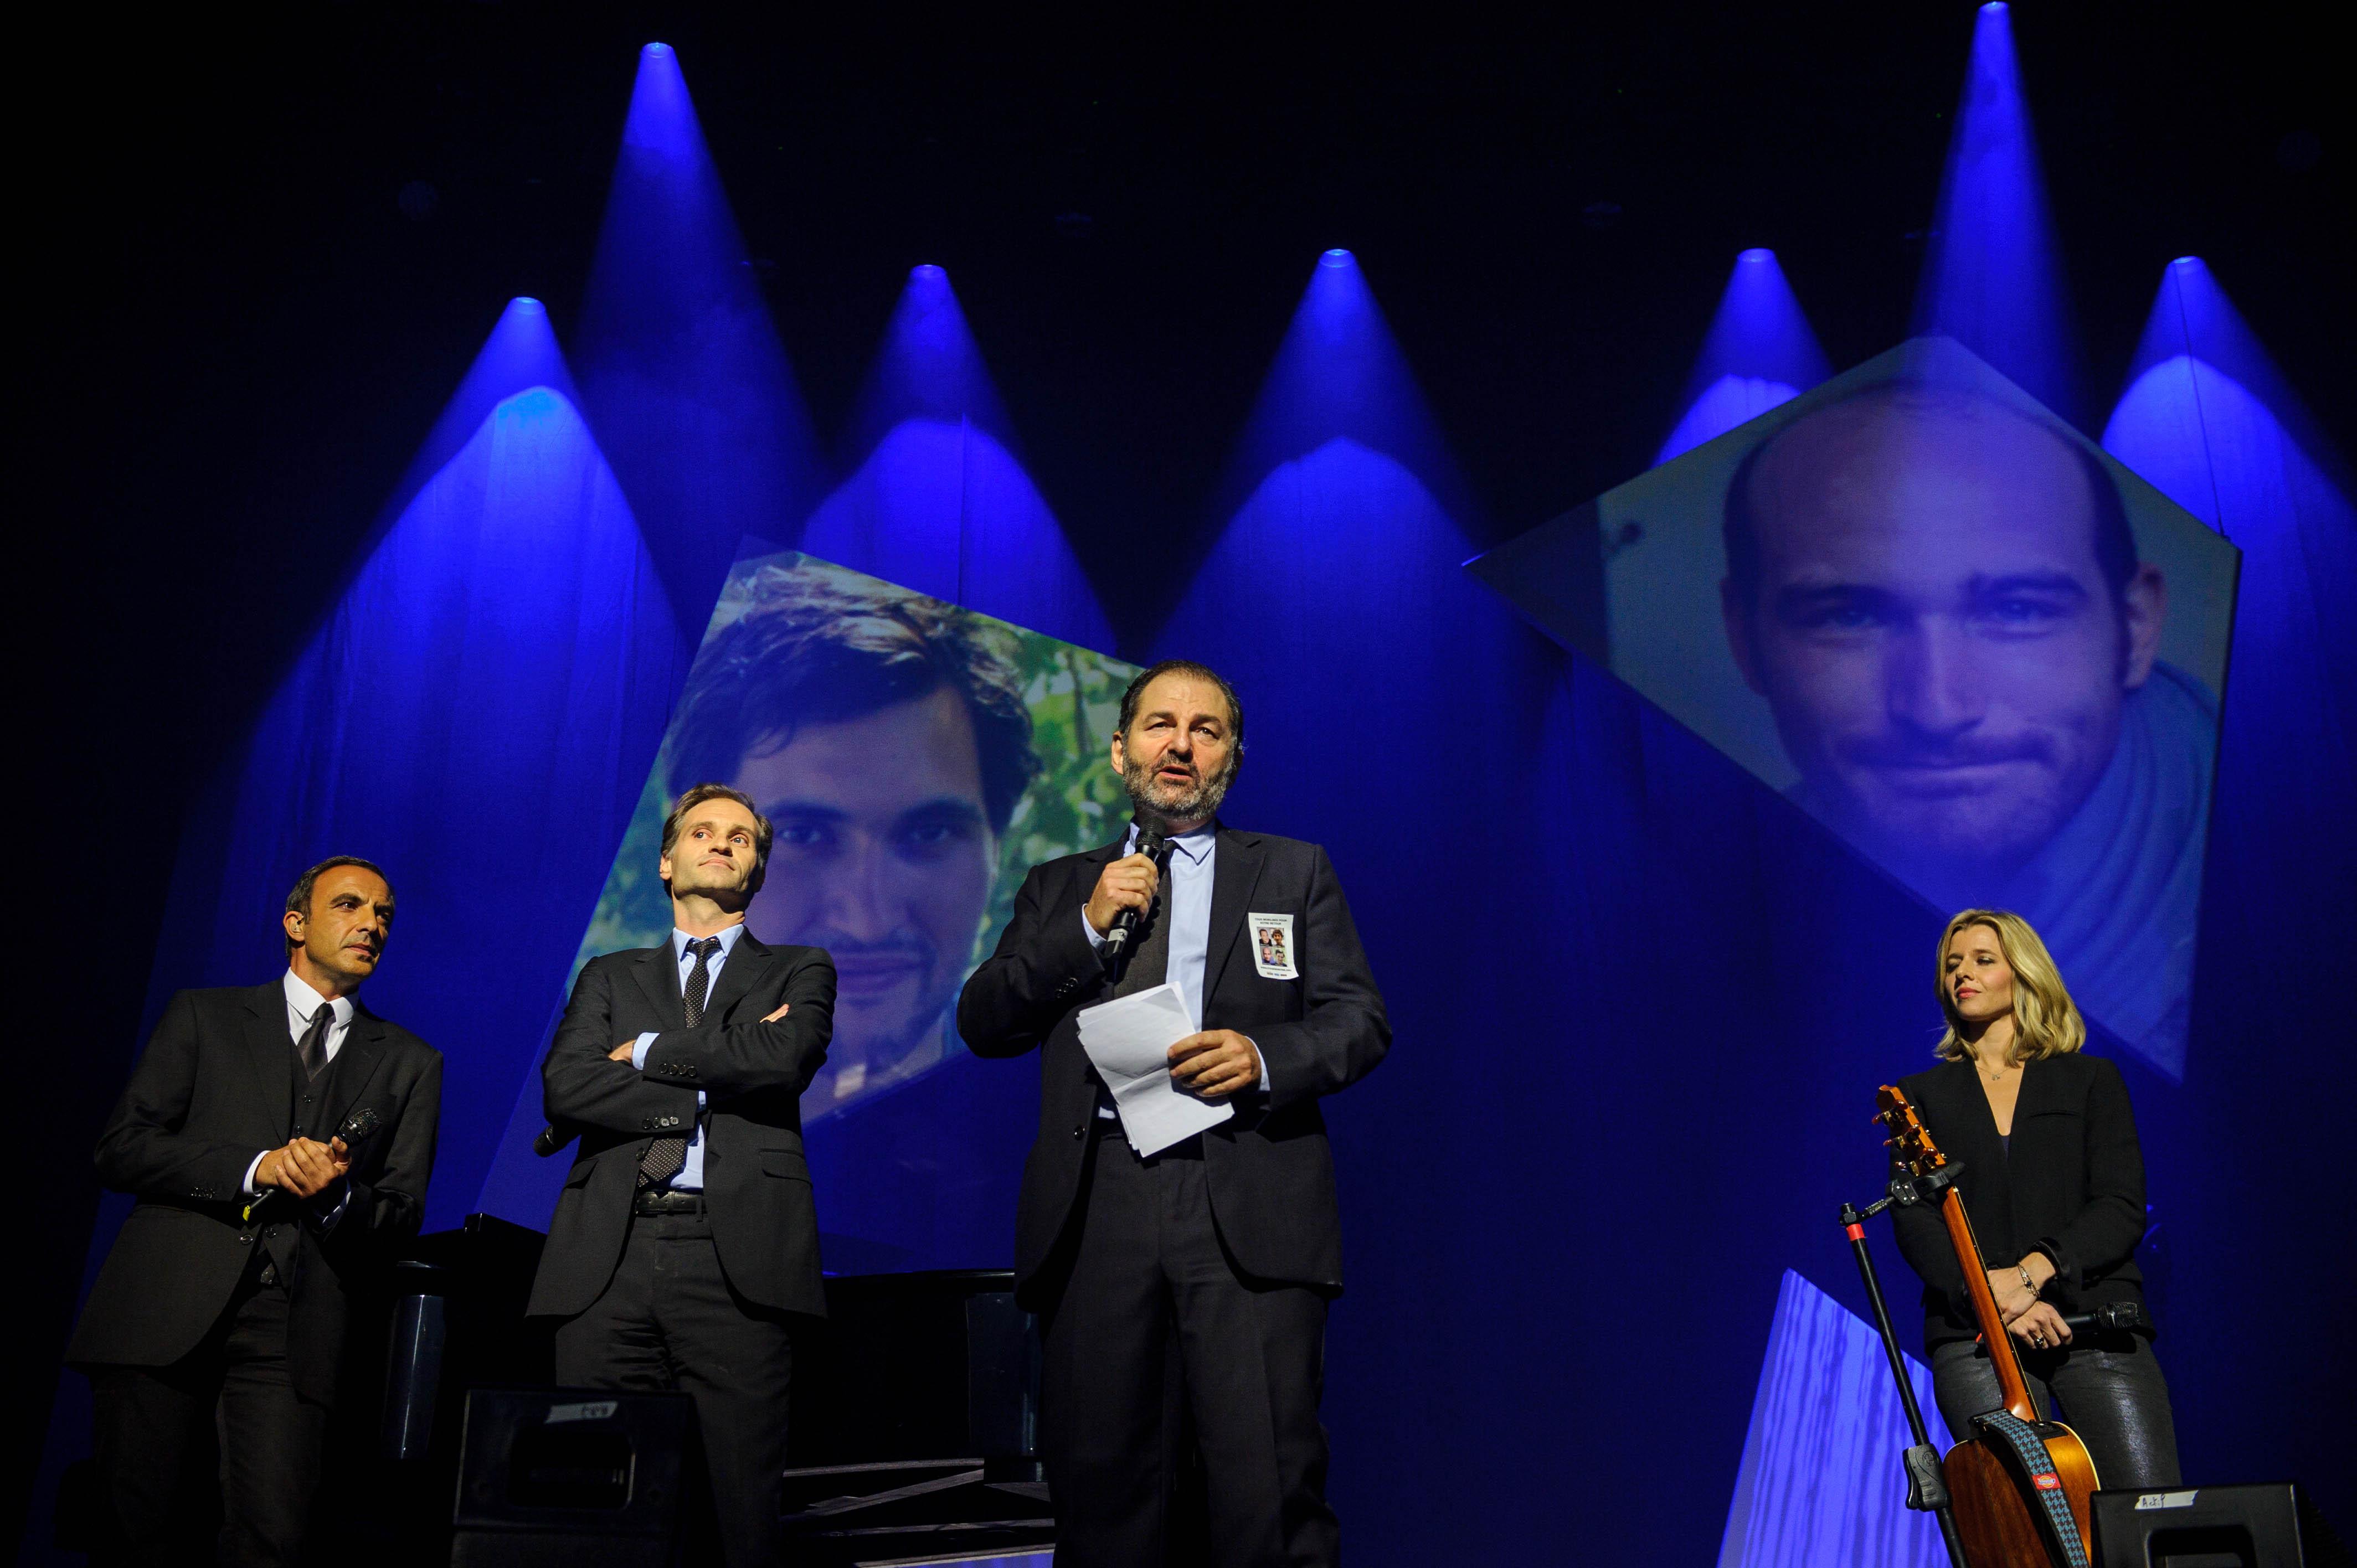 Fabien Namias et Denis Olivennes © Capa Pictures / Europe 1